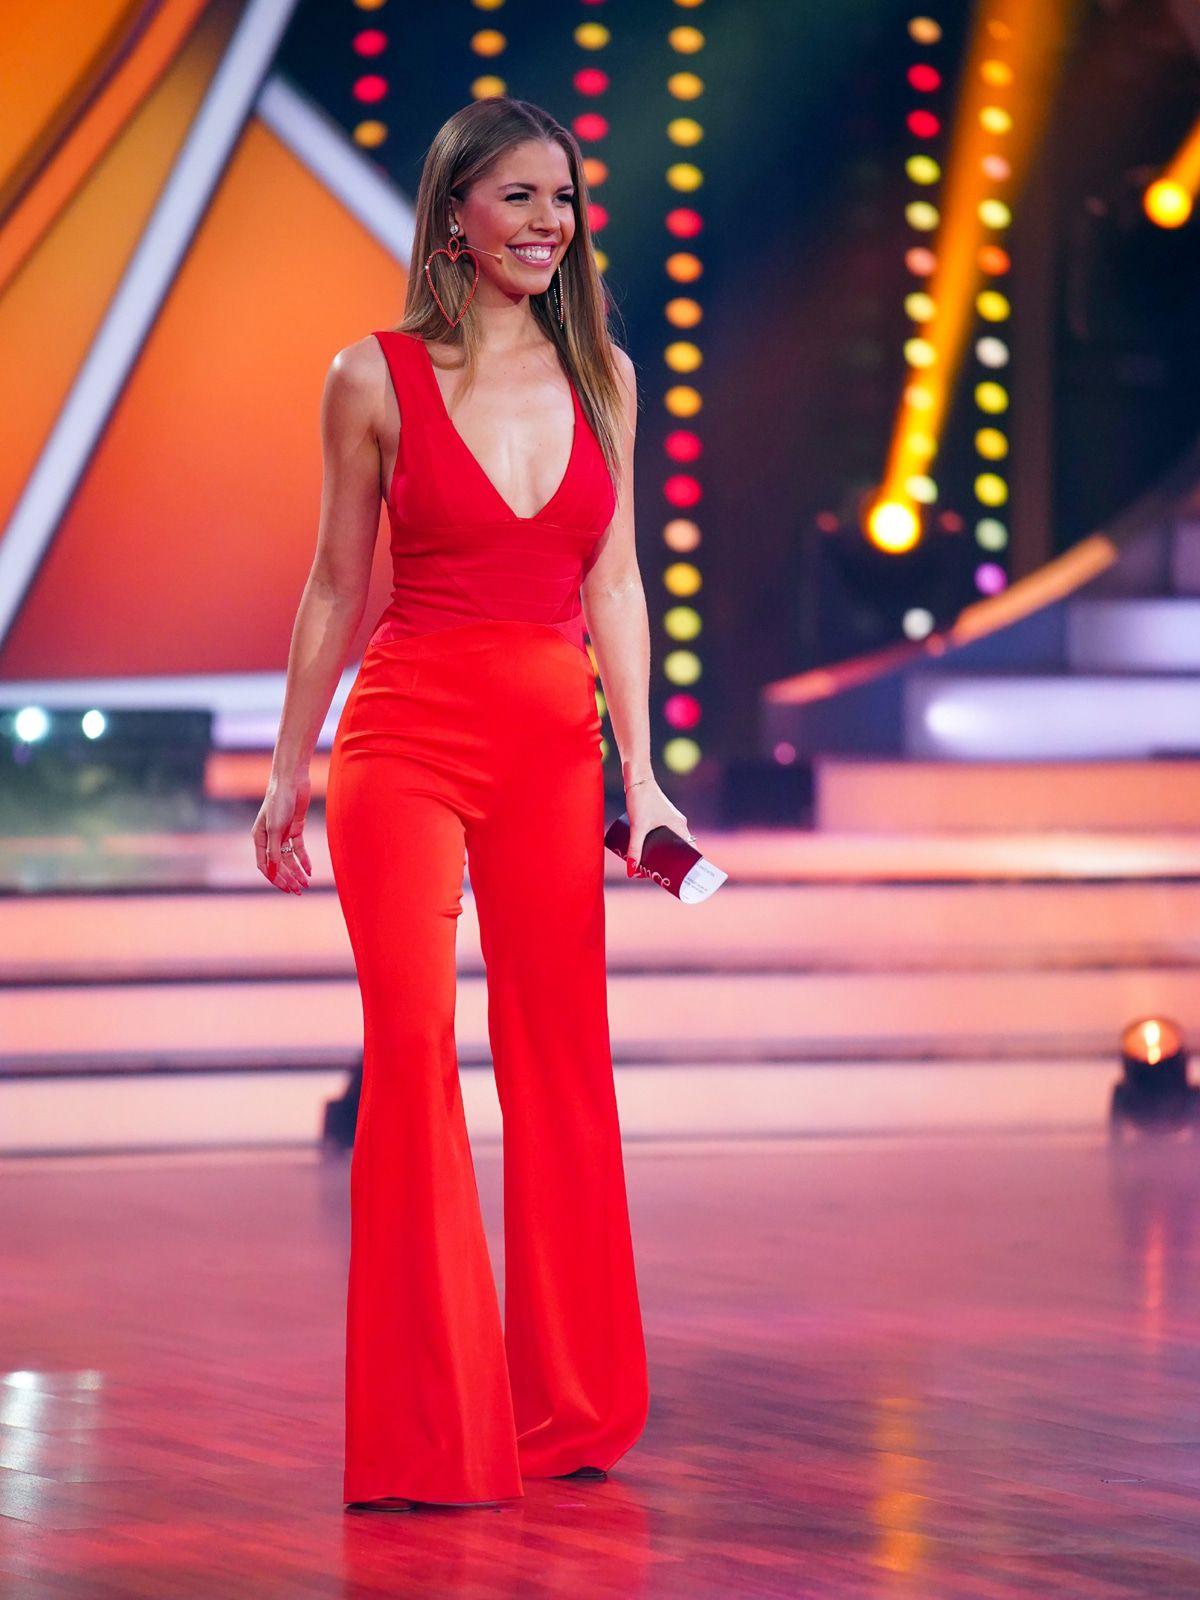 Best Dress of the Day (876): Victoria Swarovski strahlt in Rot